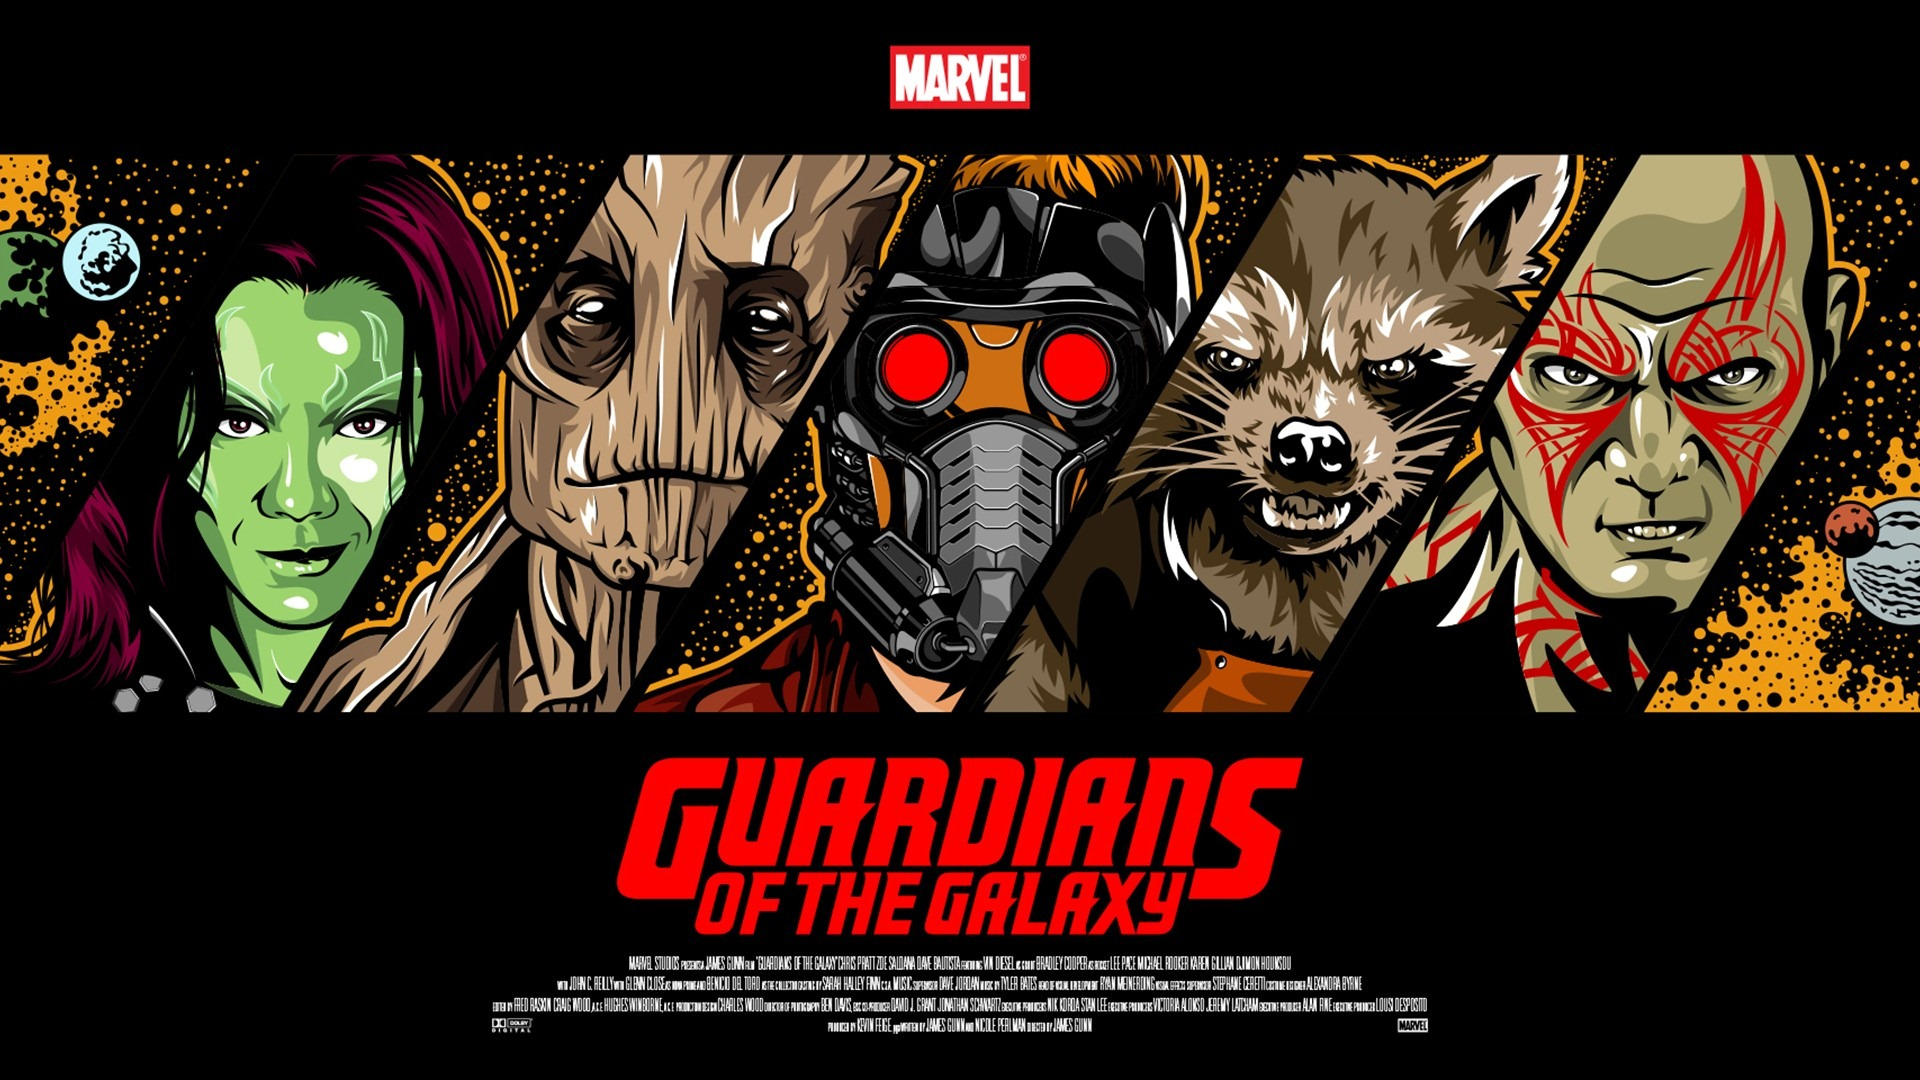 ¡go guardianes go esbilla cinematográfica popular